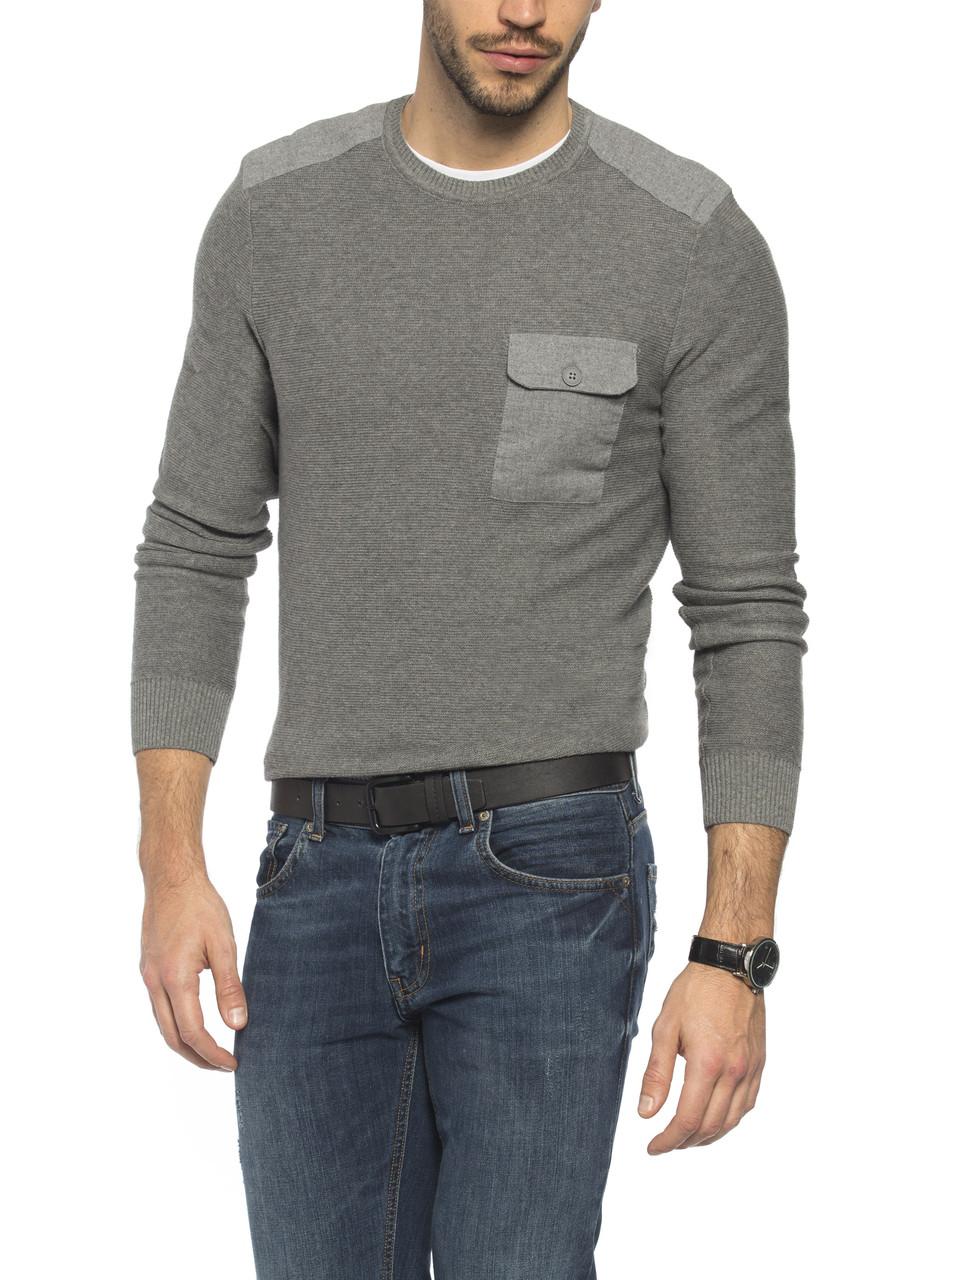 Мужской свитер LC Waikiki серого цвета с карманом на груди